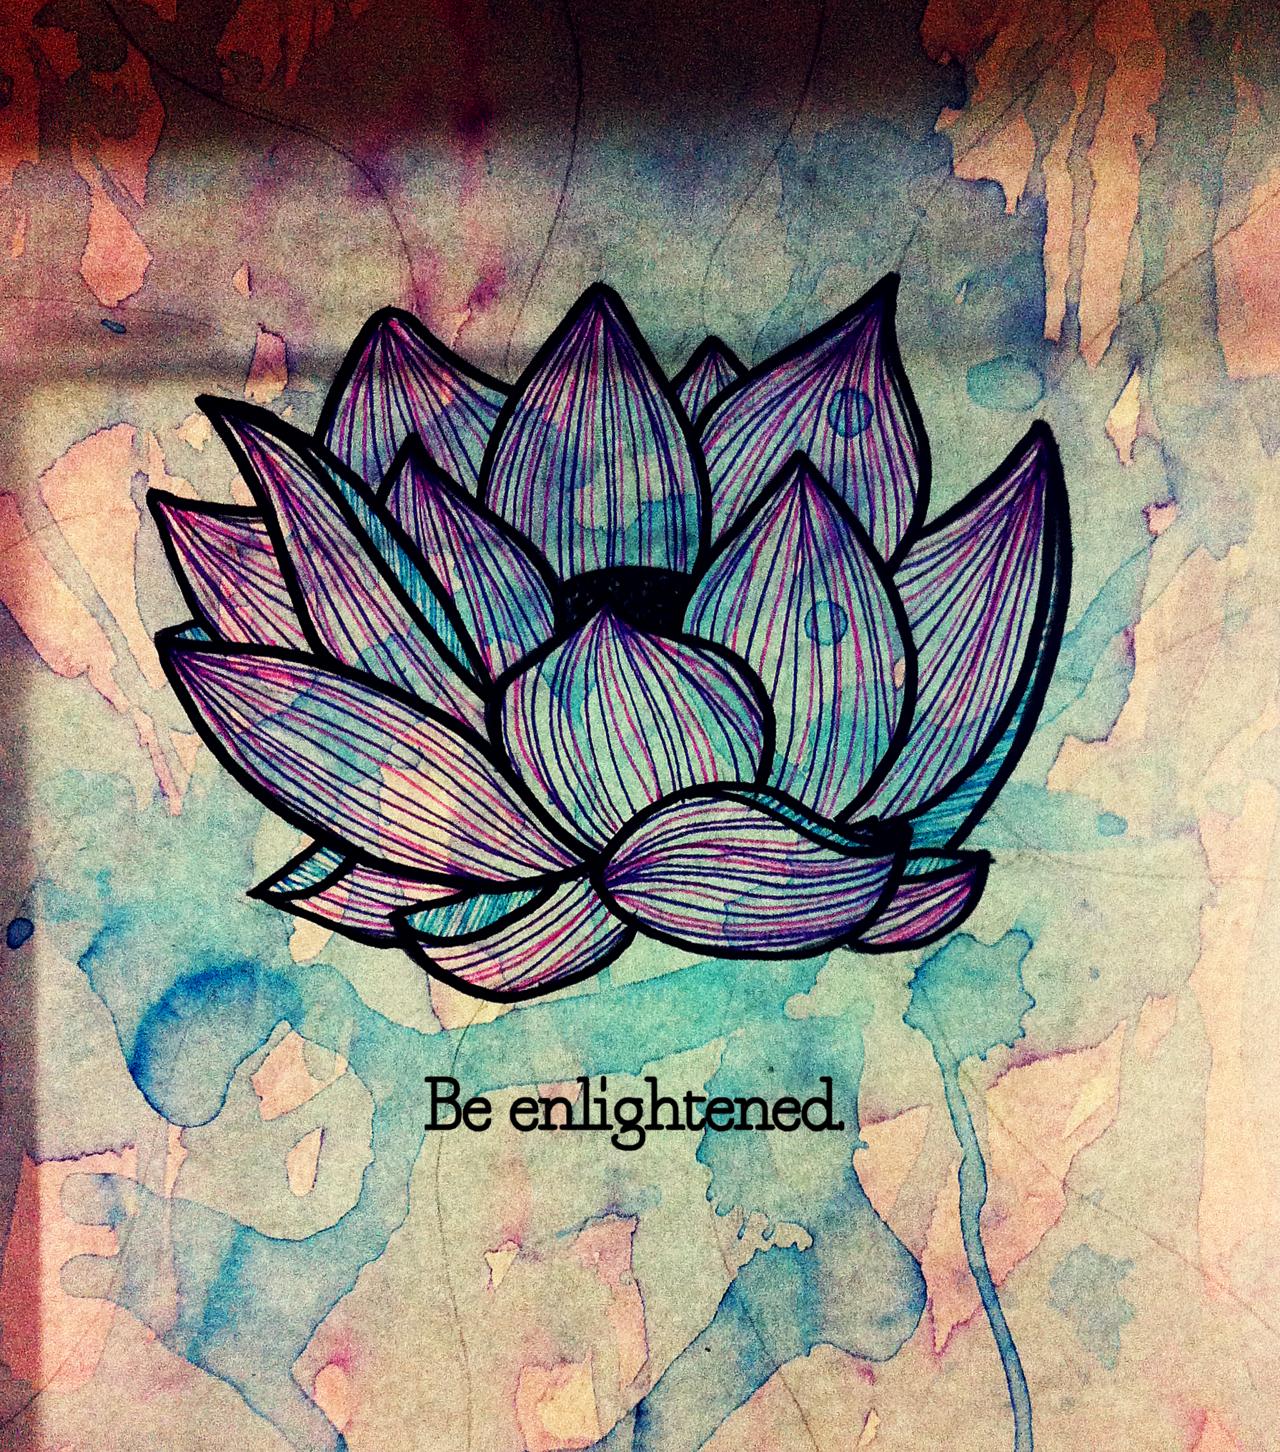 Be enlightened quote and artwork from free people tattoos ancora imparo lotus tattoowrist tattoolotus flowerslotus izmirmasajfo